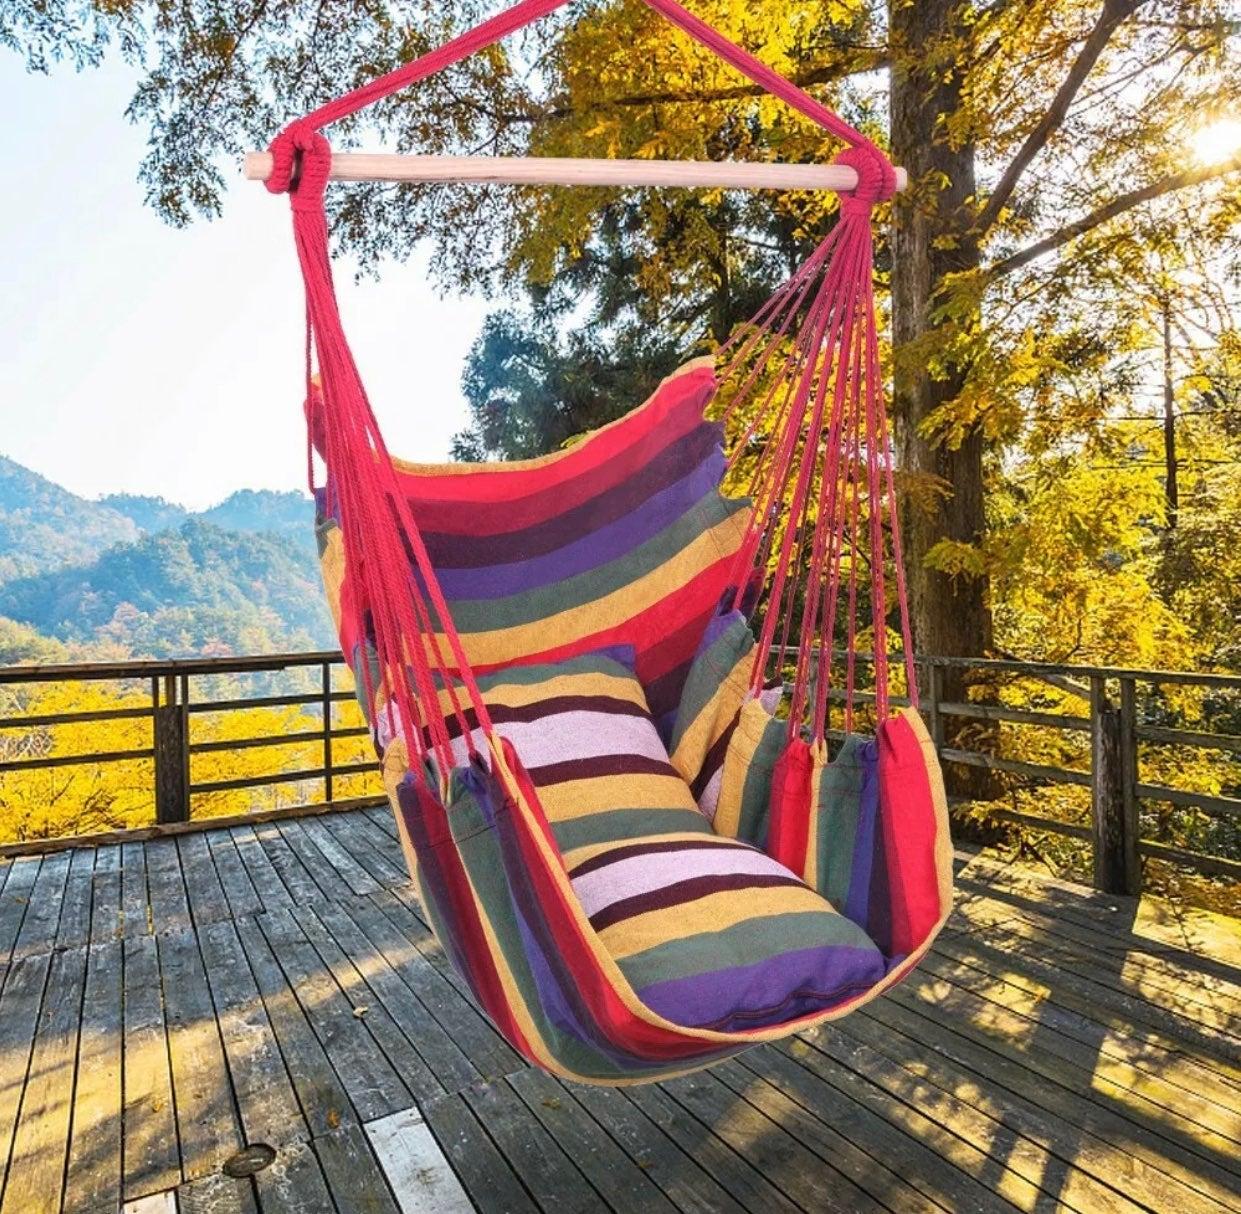 New Indoors Outdoors Hammock Chair Swing